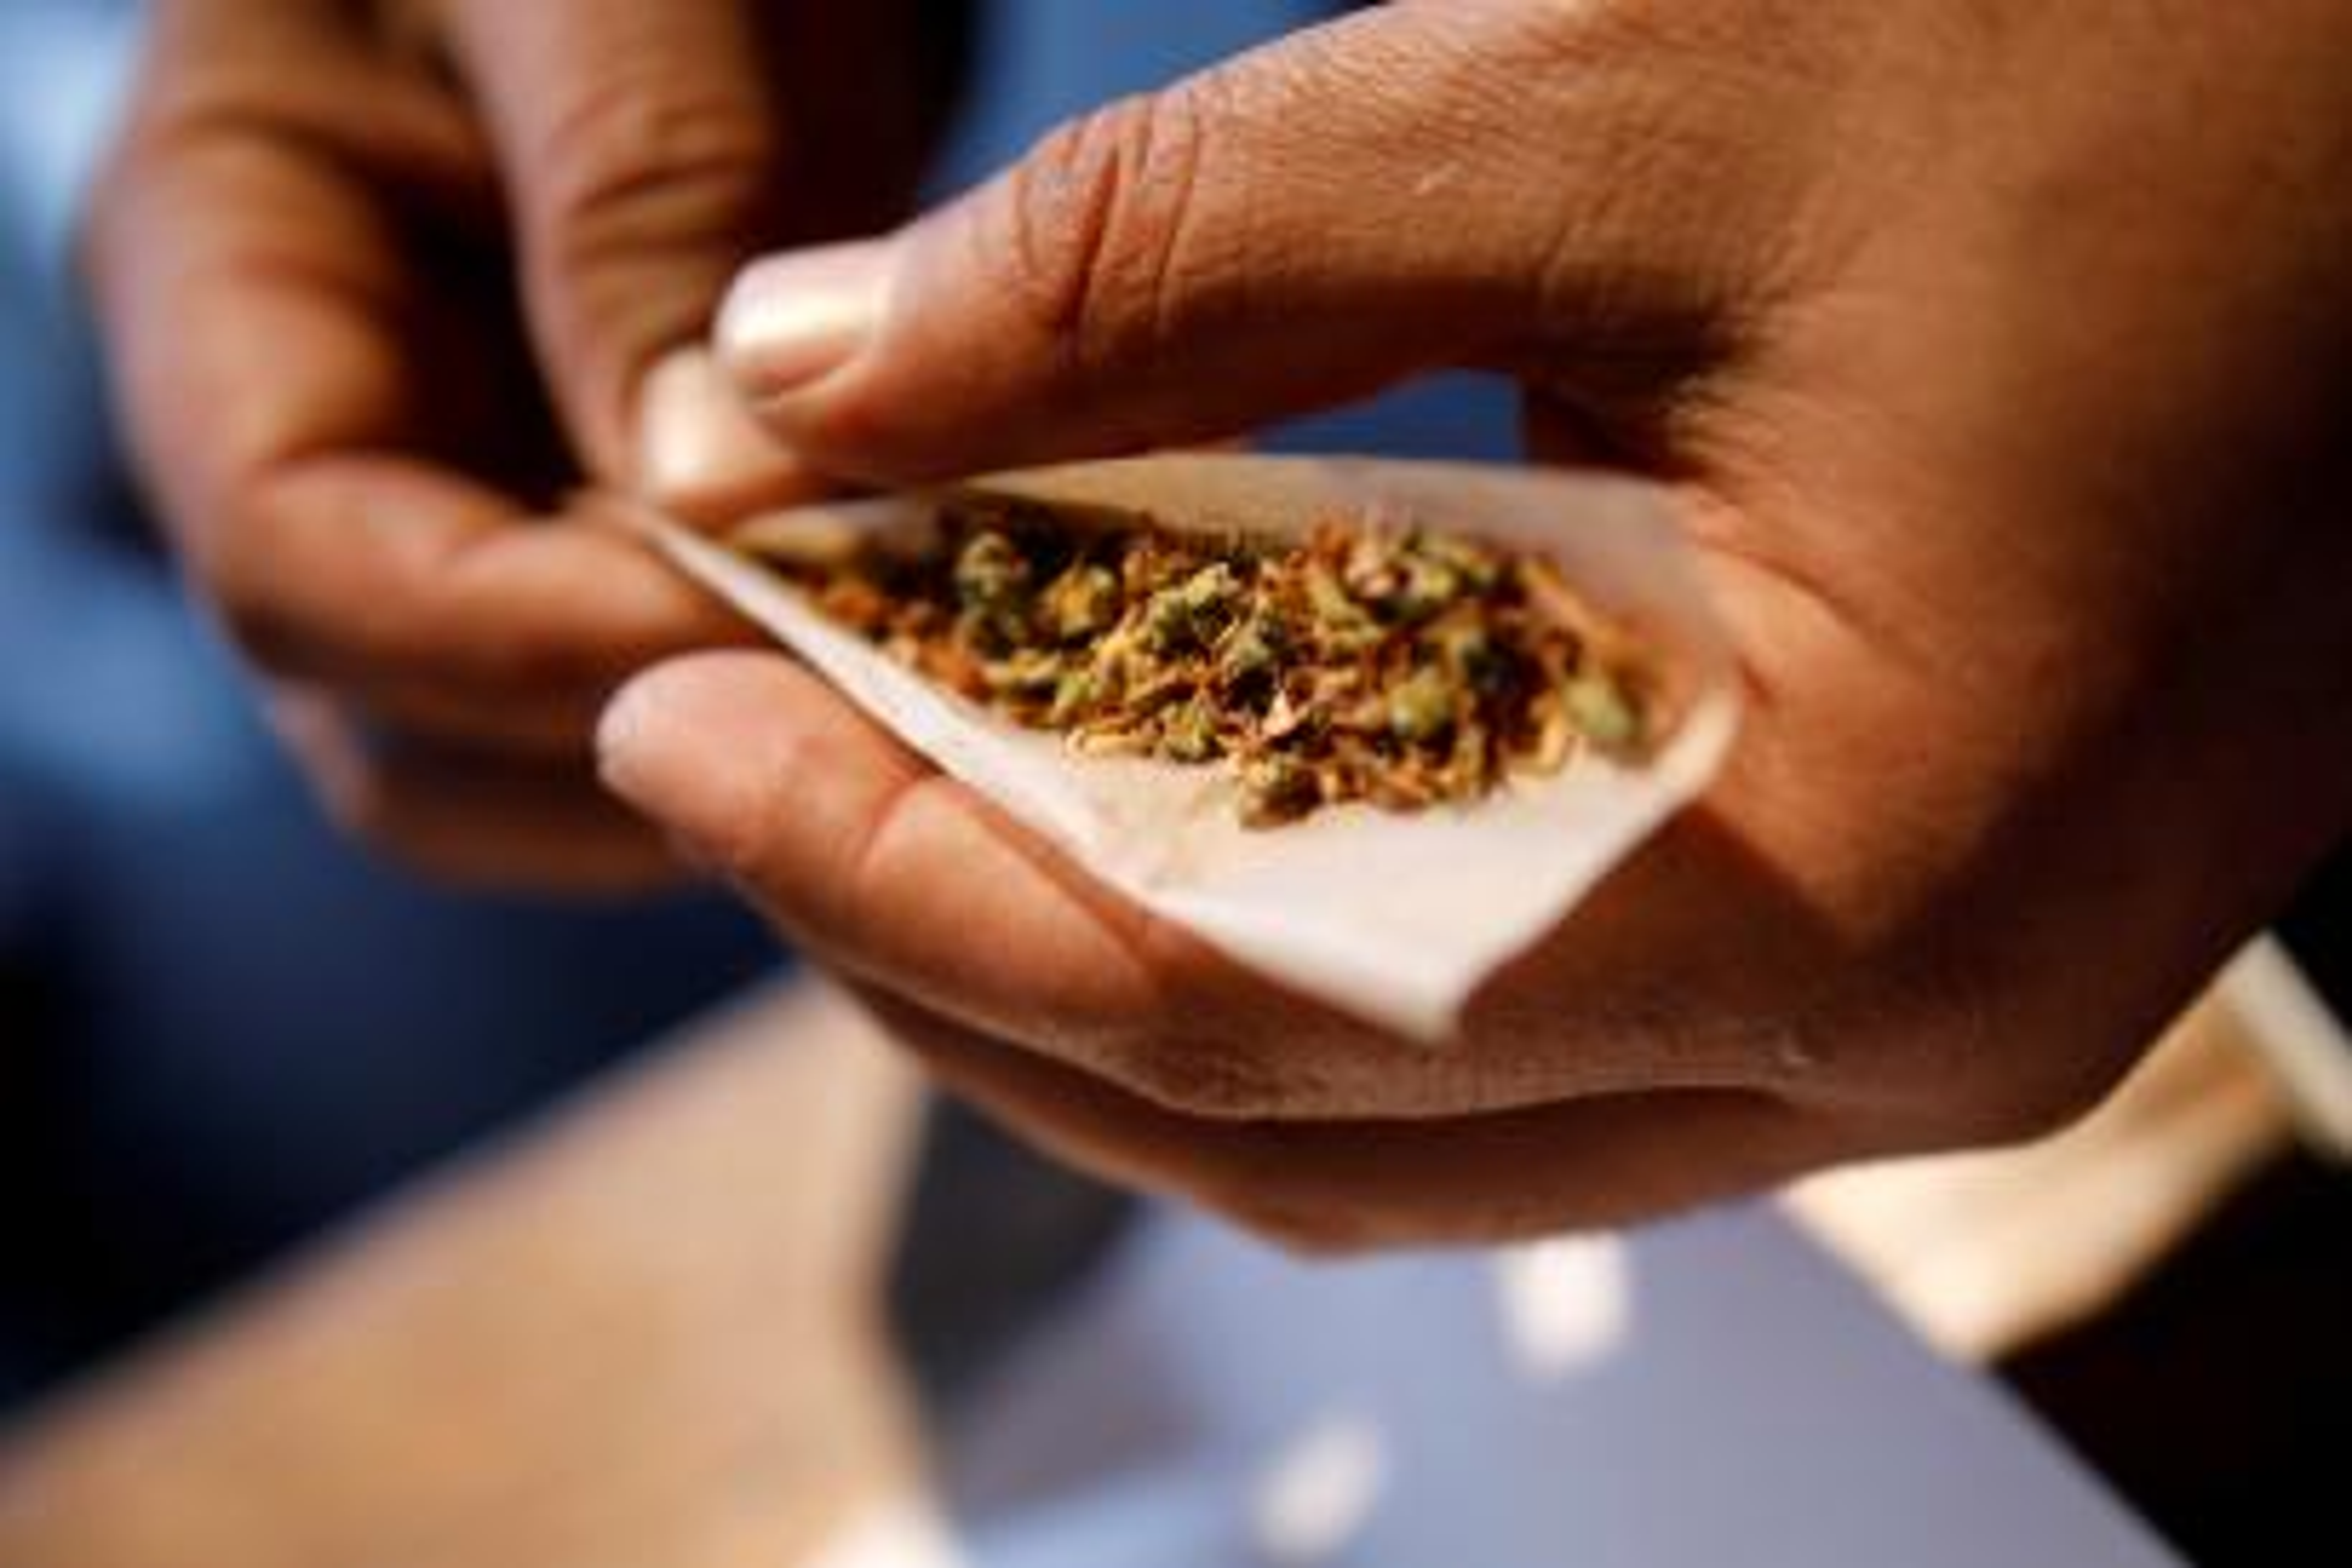 A man rolls a joint.